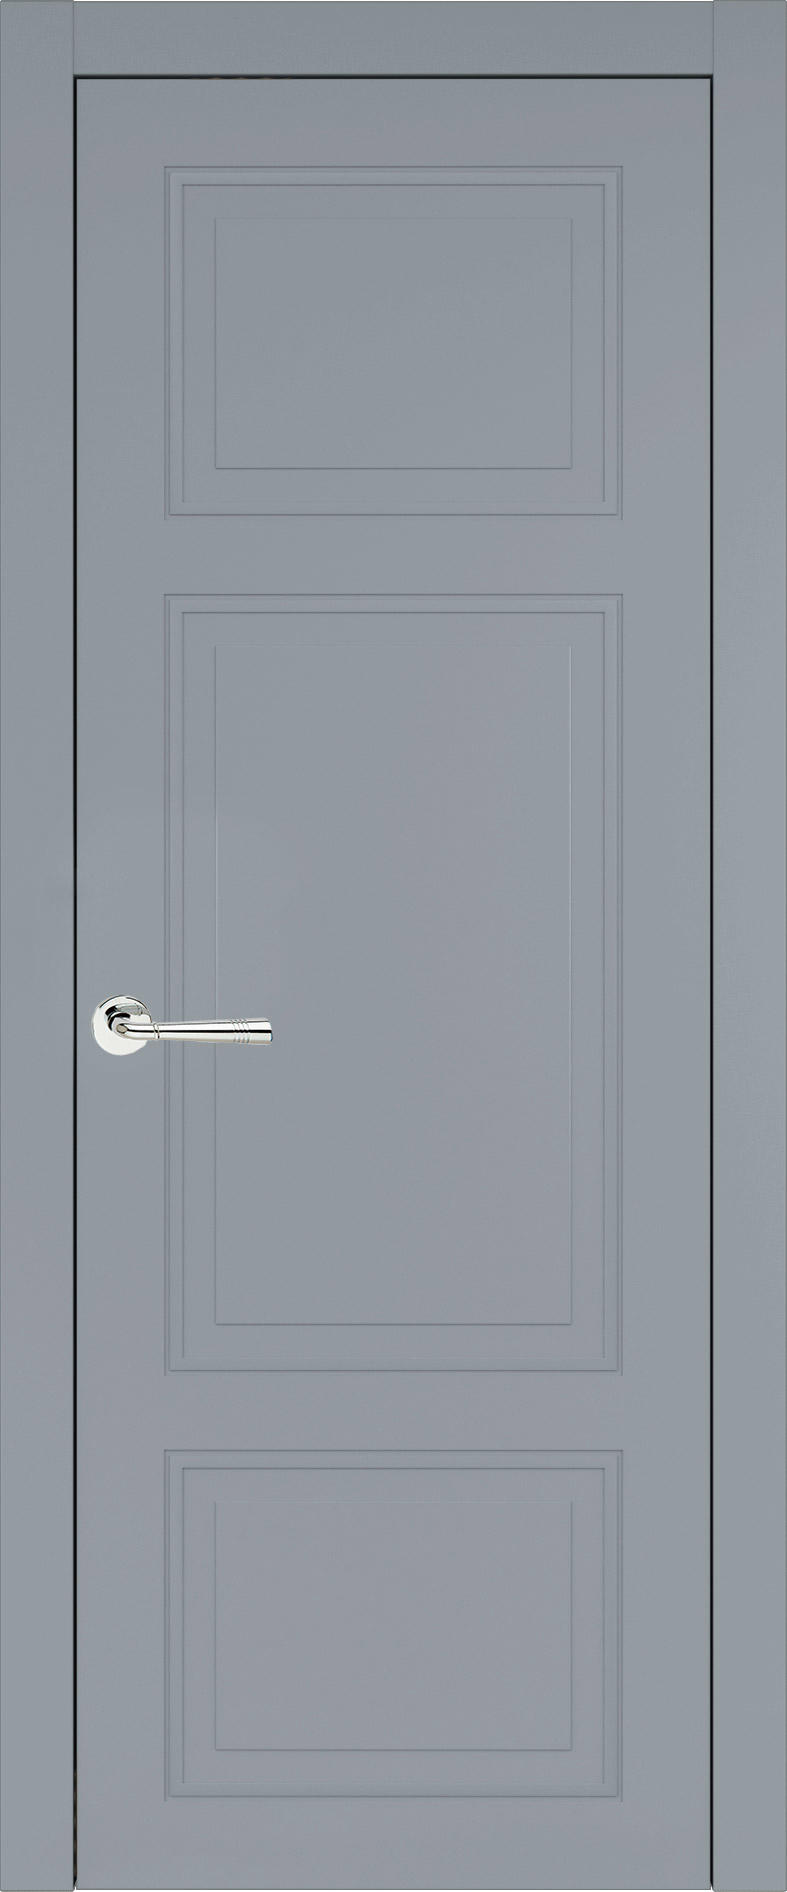 Siena Neo Classic цвет - Серебристо-серая эмаль (RAL 7045) Без стекла (ДГ)